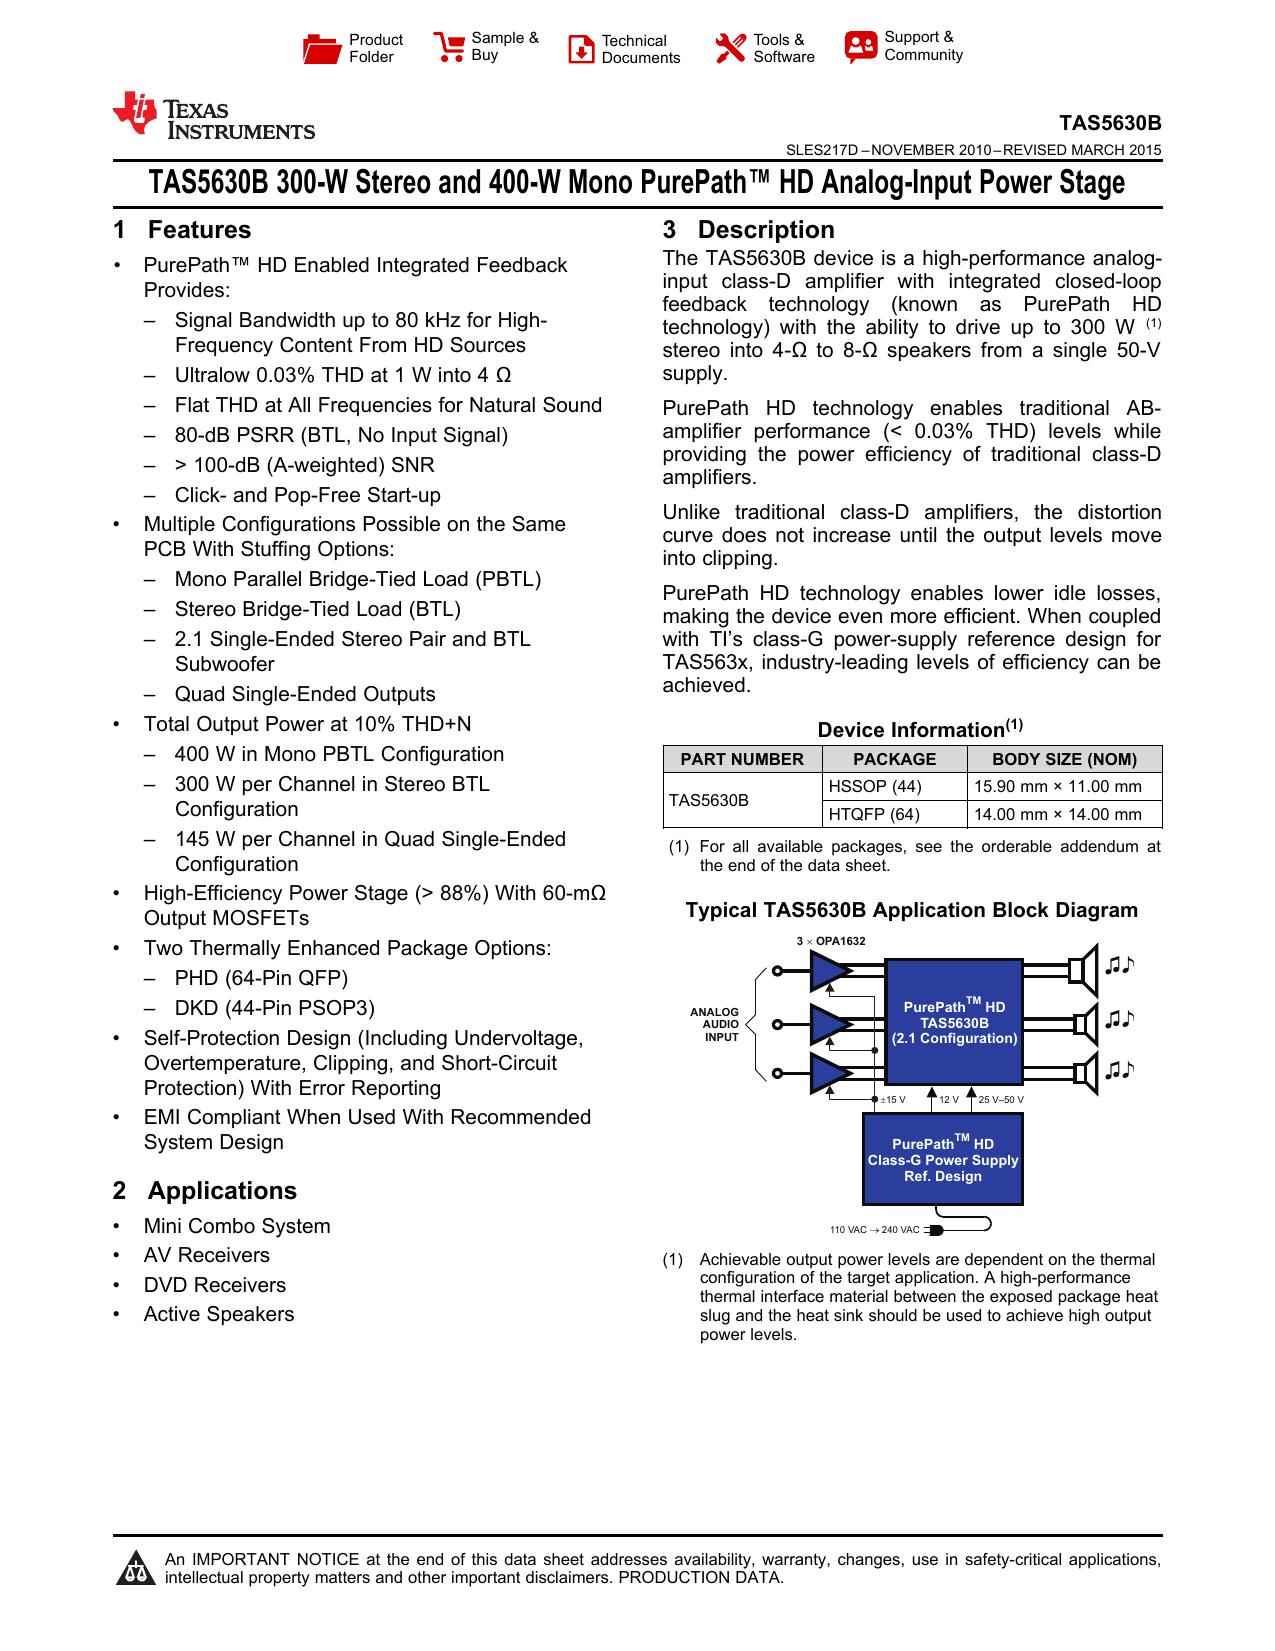 TAS5630B - Texas Instruments